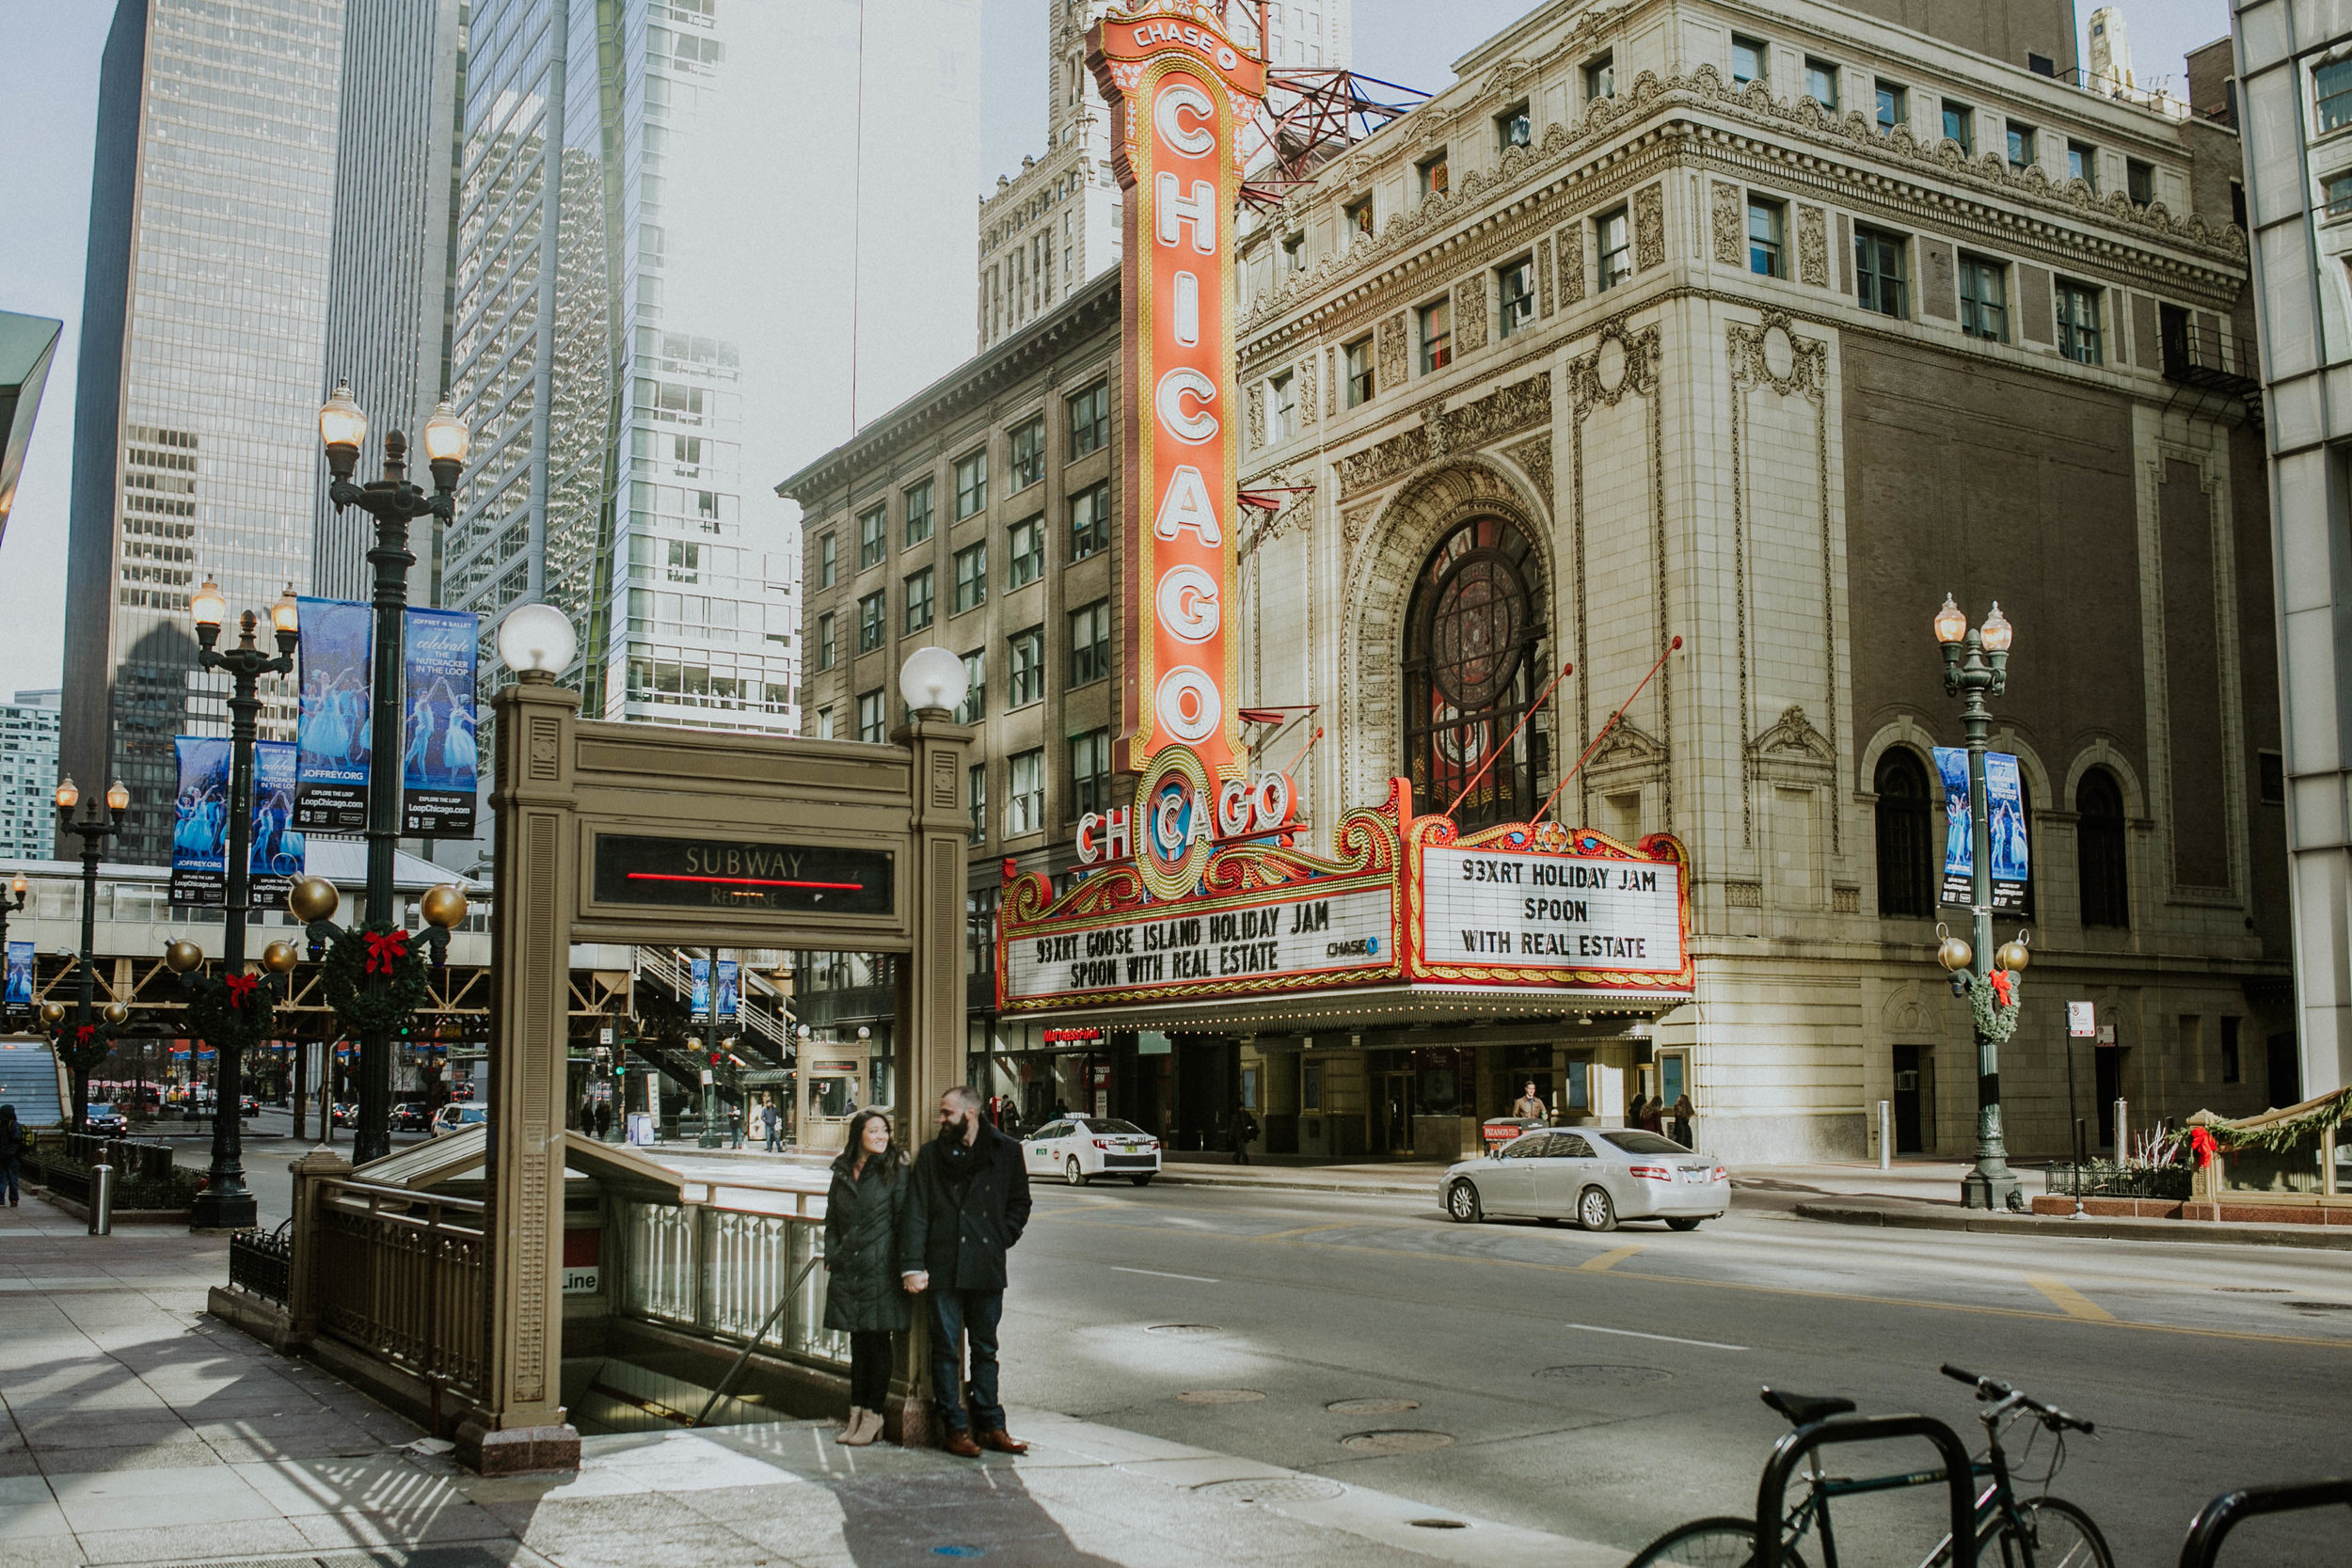 Chicago Engagement-30.jpg